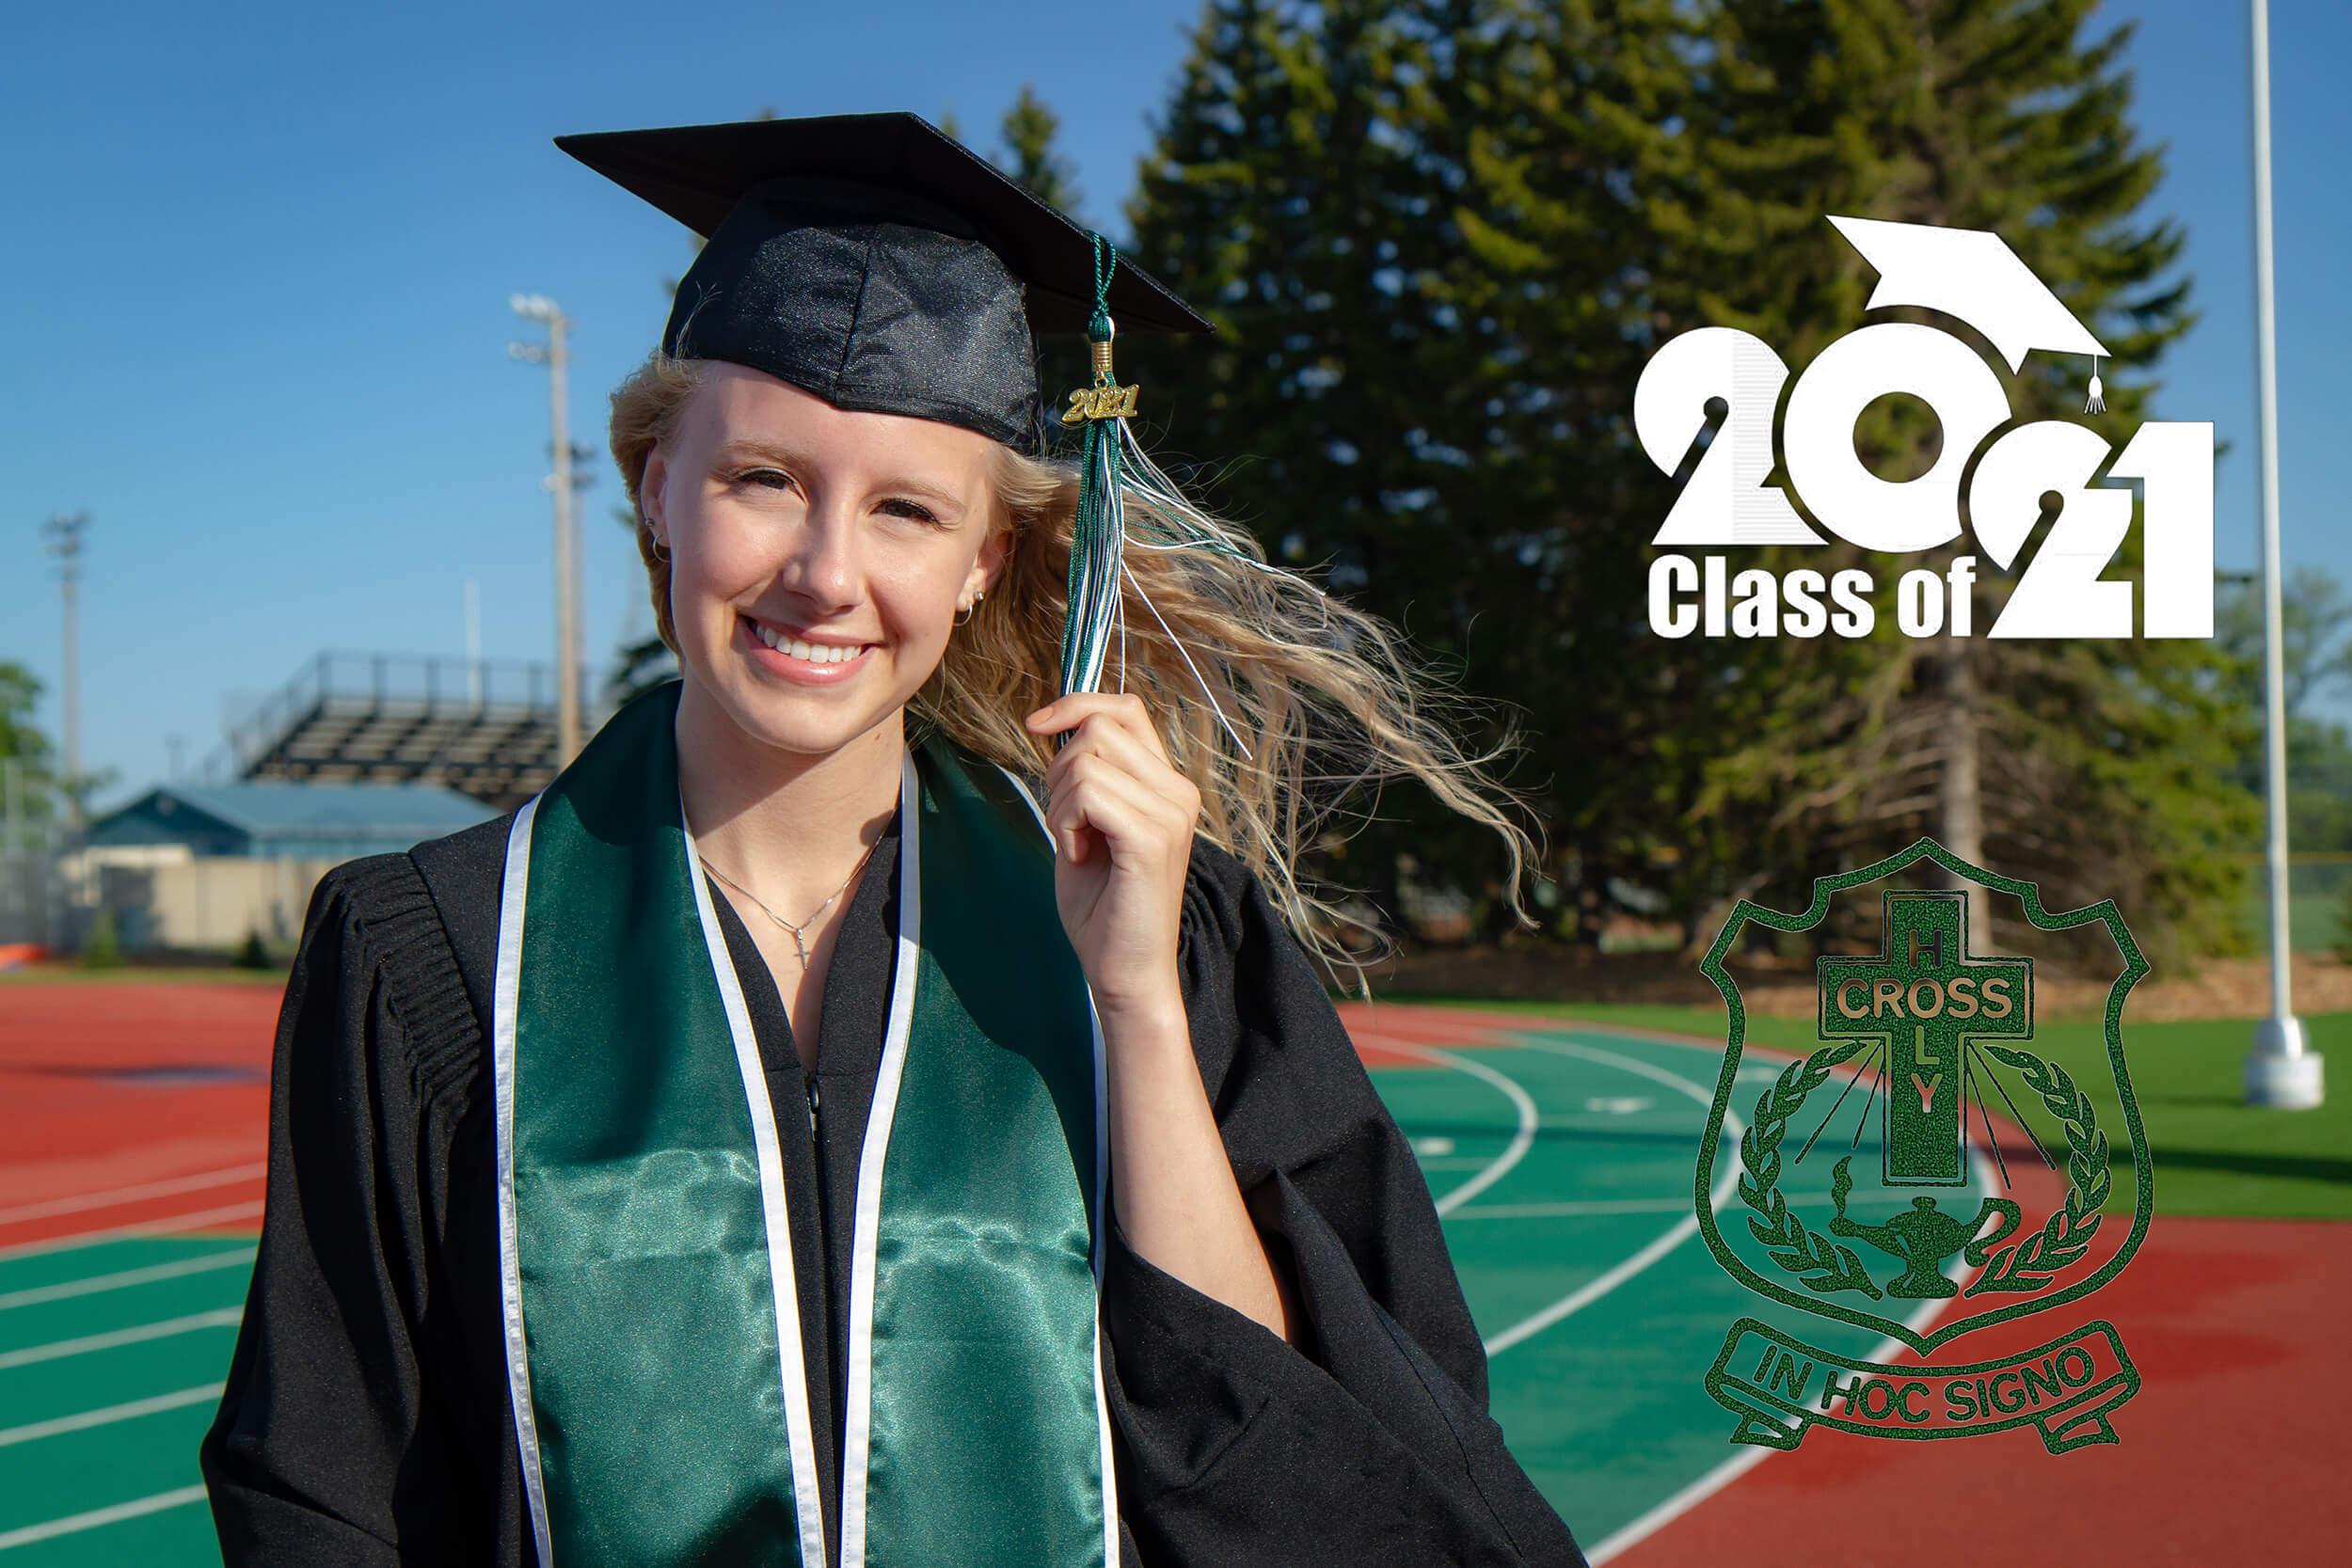 Saskatoon Grad Photos Roses & Scars Photography